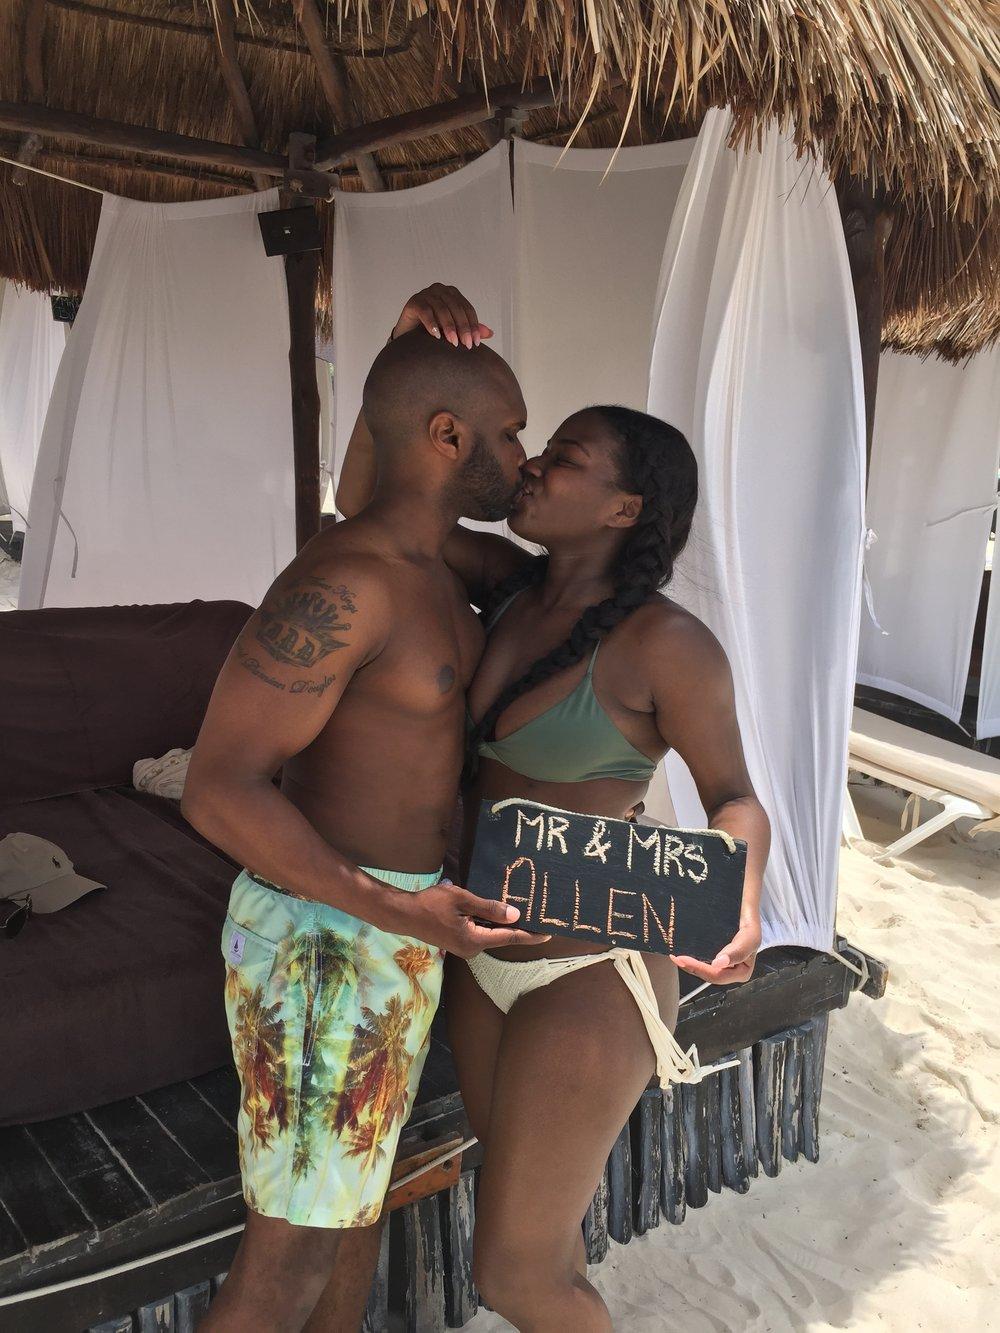 Black Destination Bride - BlackDesti Wedding Countdown Journal - Bridefriends Podcast - 1 Playa del Carmen Mexico - Secrets Maroma beach cabana ChOmi.JPG